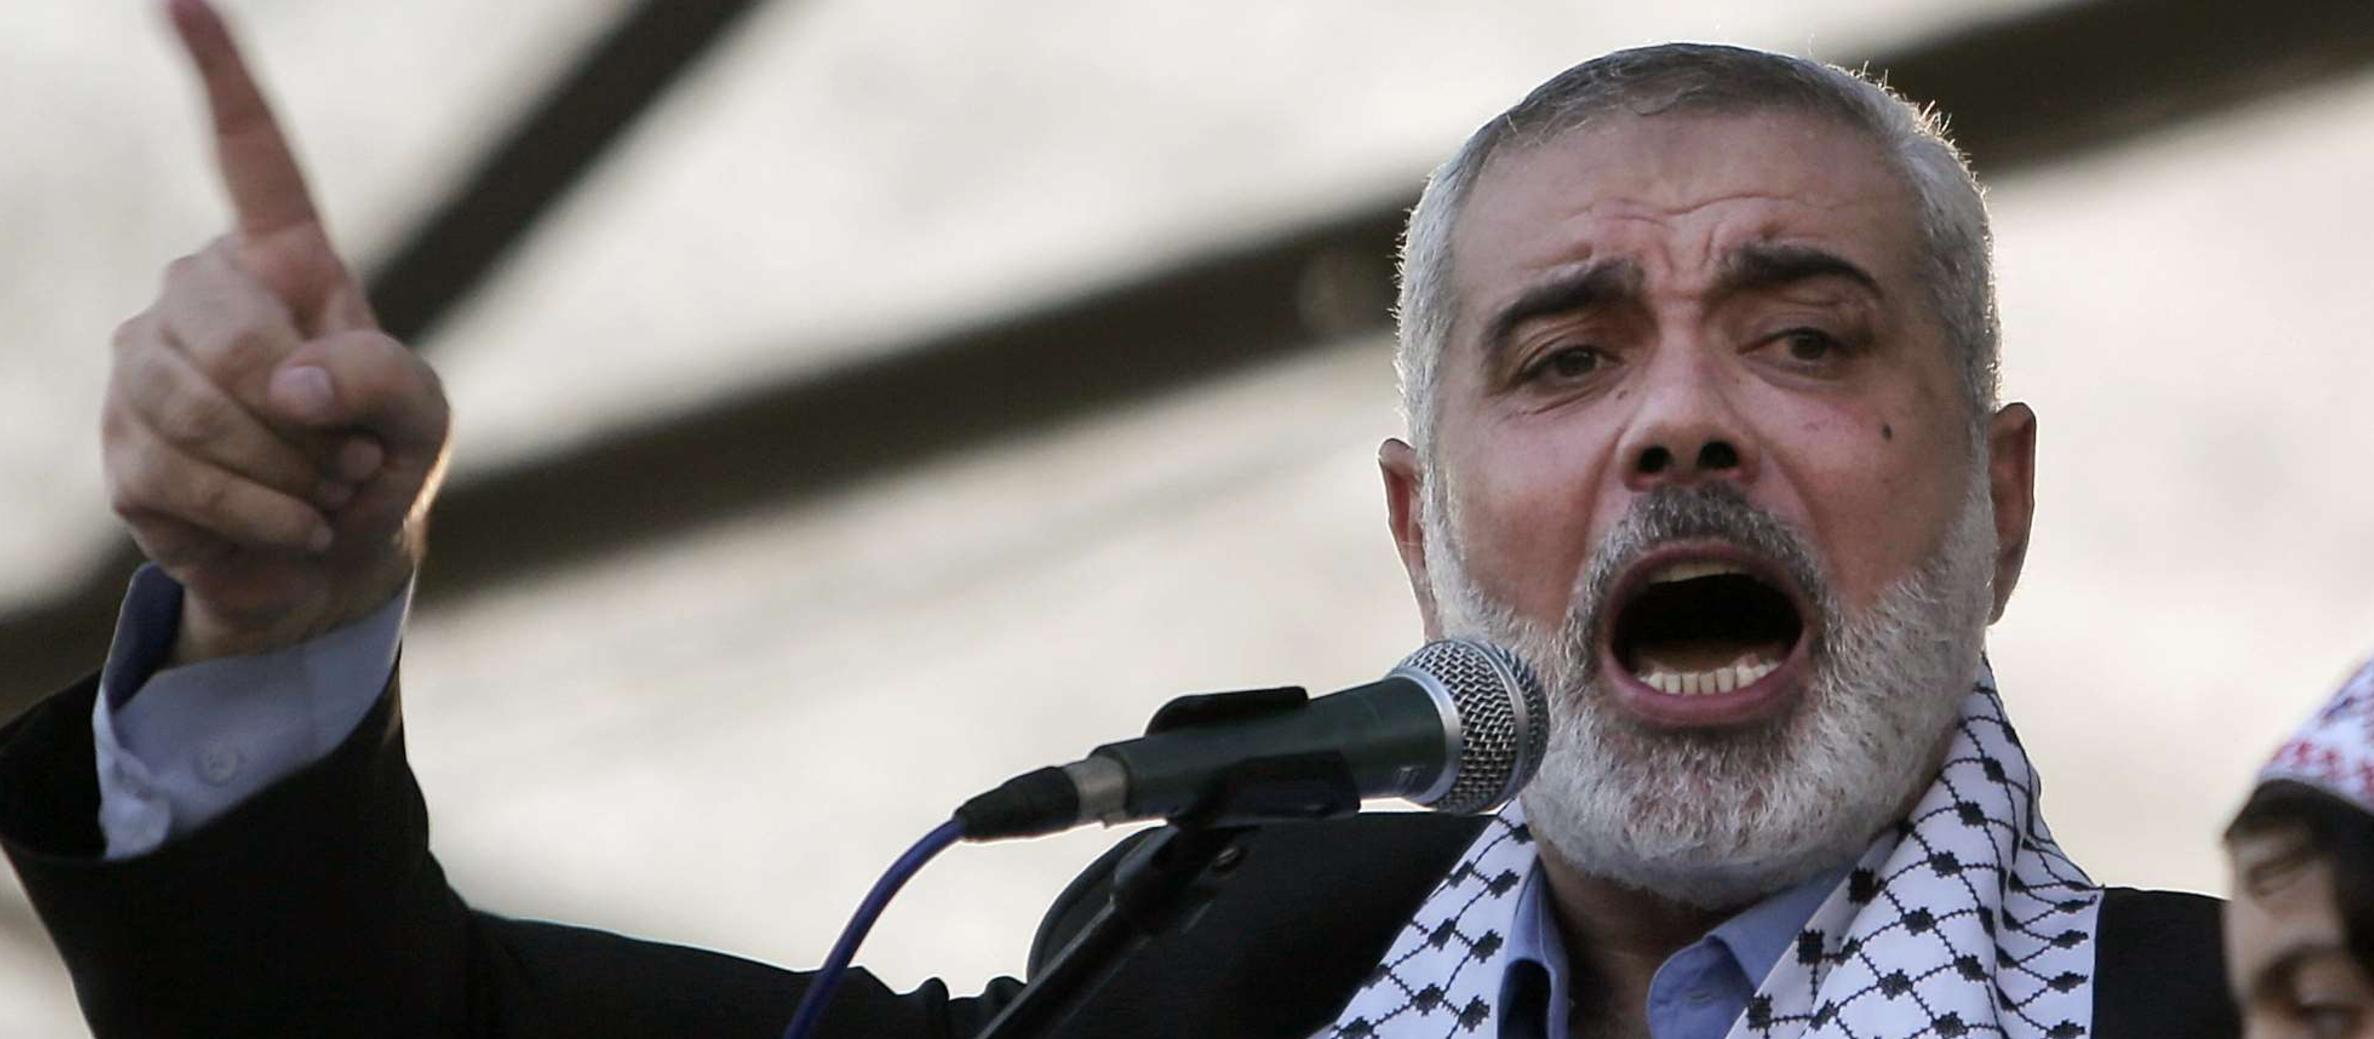 Hamas praises murder of Israeli civilian, promises more attacks